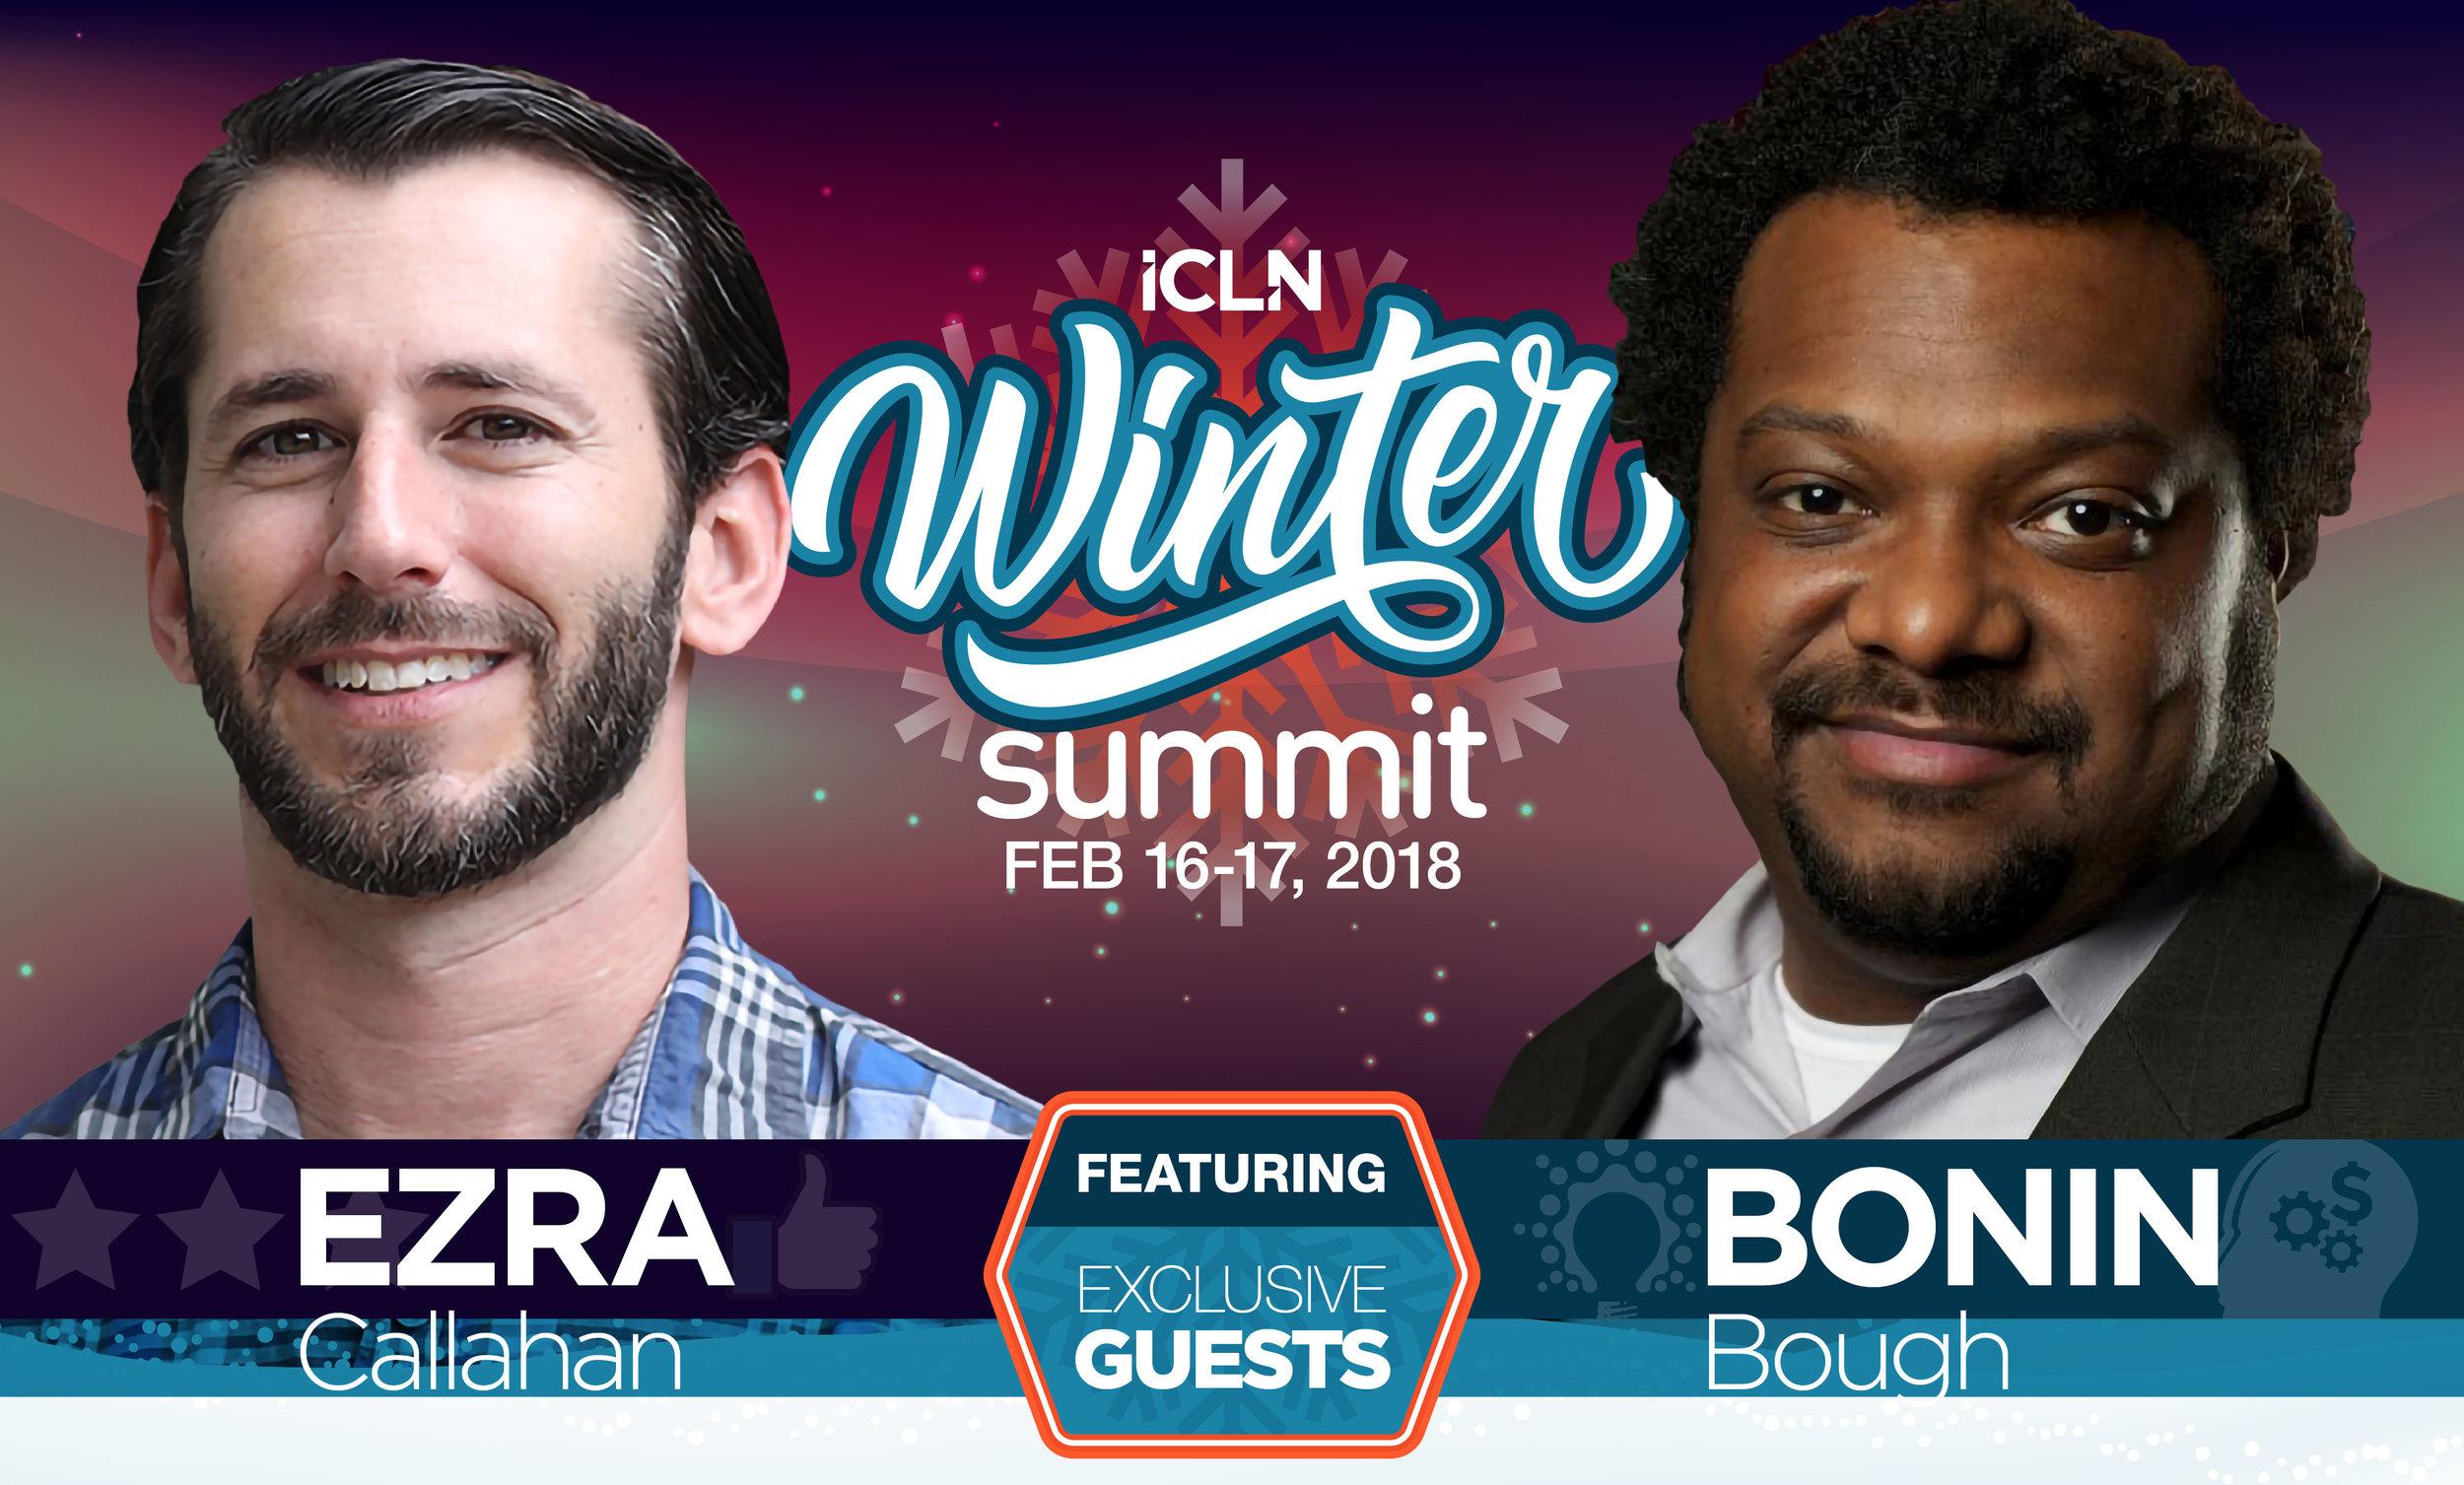 180131-ICLN-Winter-Summit-Ezra-Callahan-Bonin-Bough-Innovation-Collective-v1.jpg